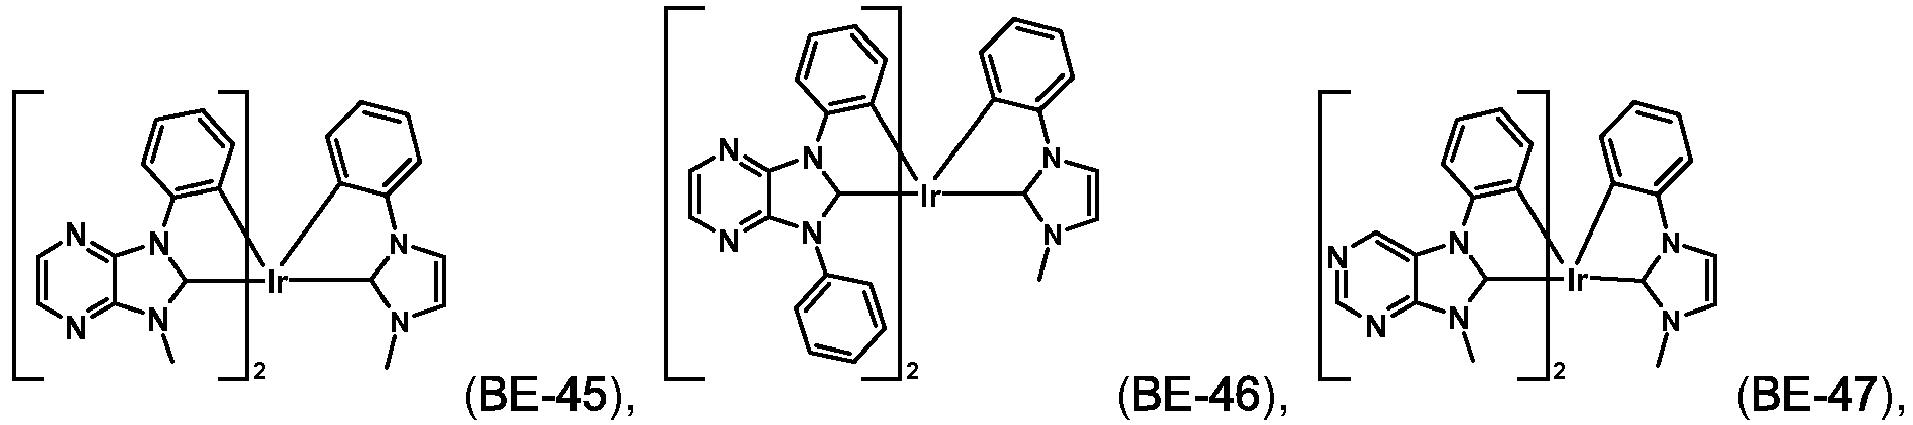 Figure imgb0769